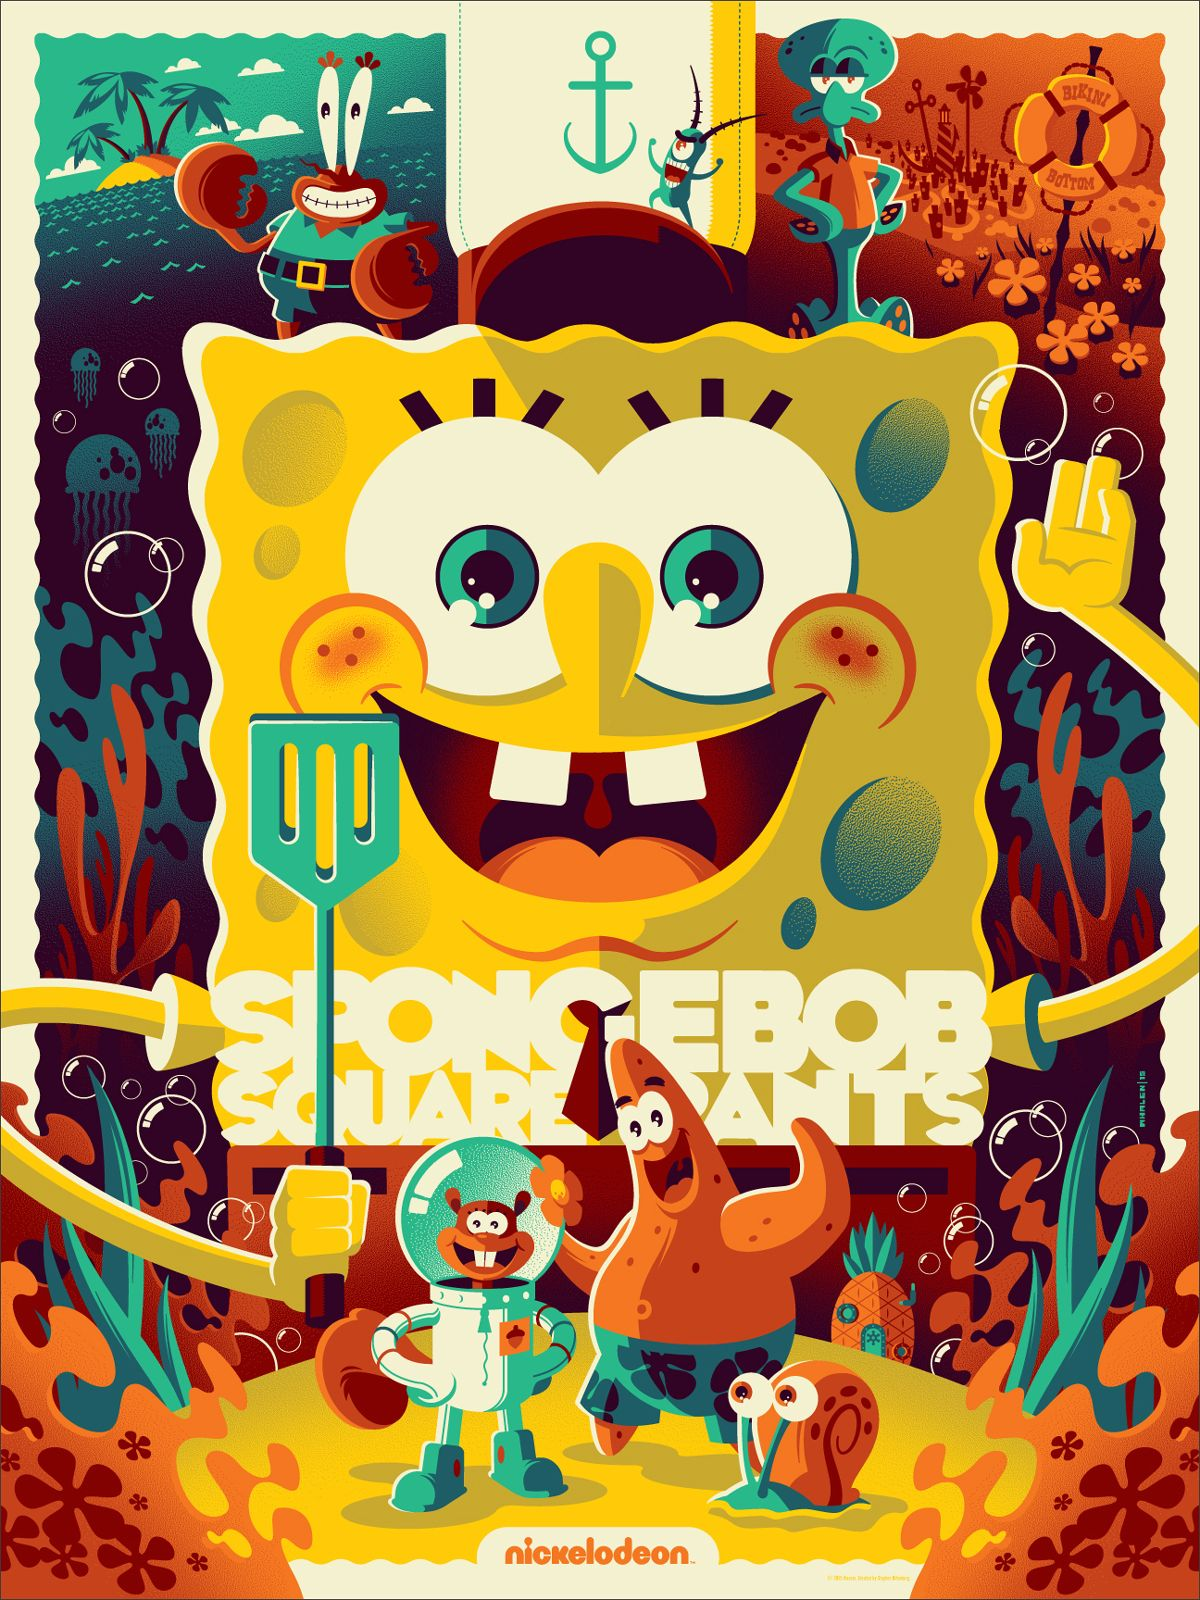 SpongeBob SquarePants Poster - Tom Whalen | IDW | Pinterest | Tom ...